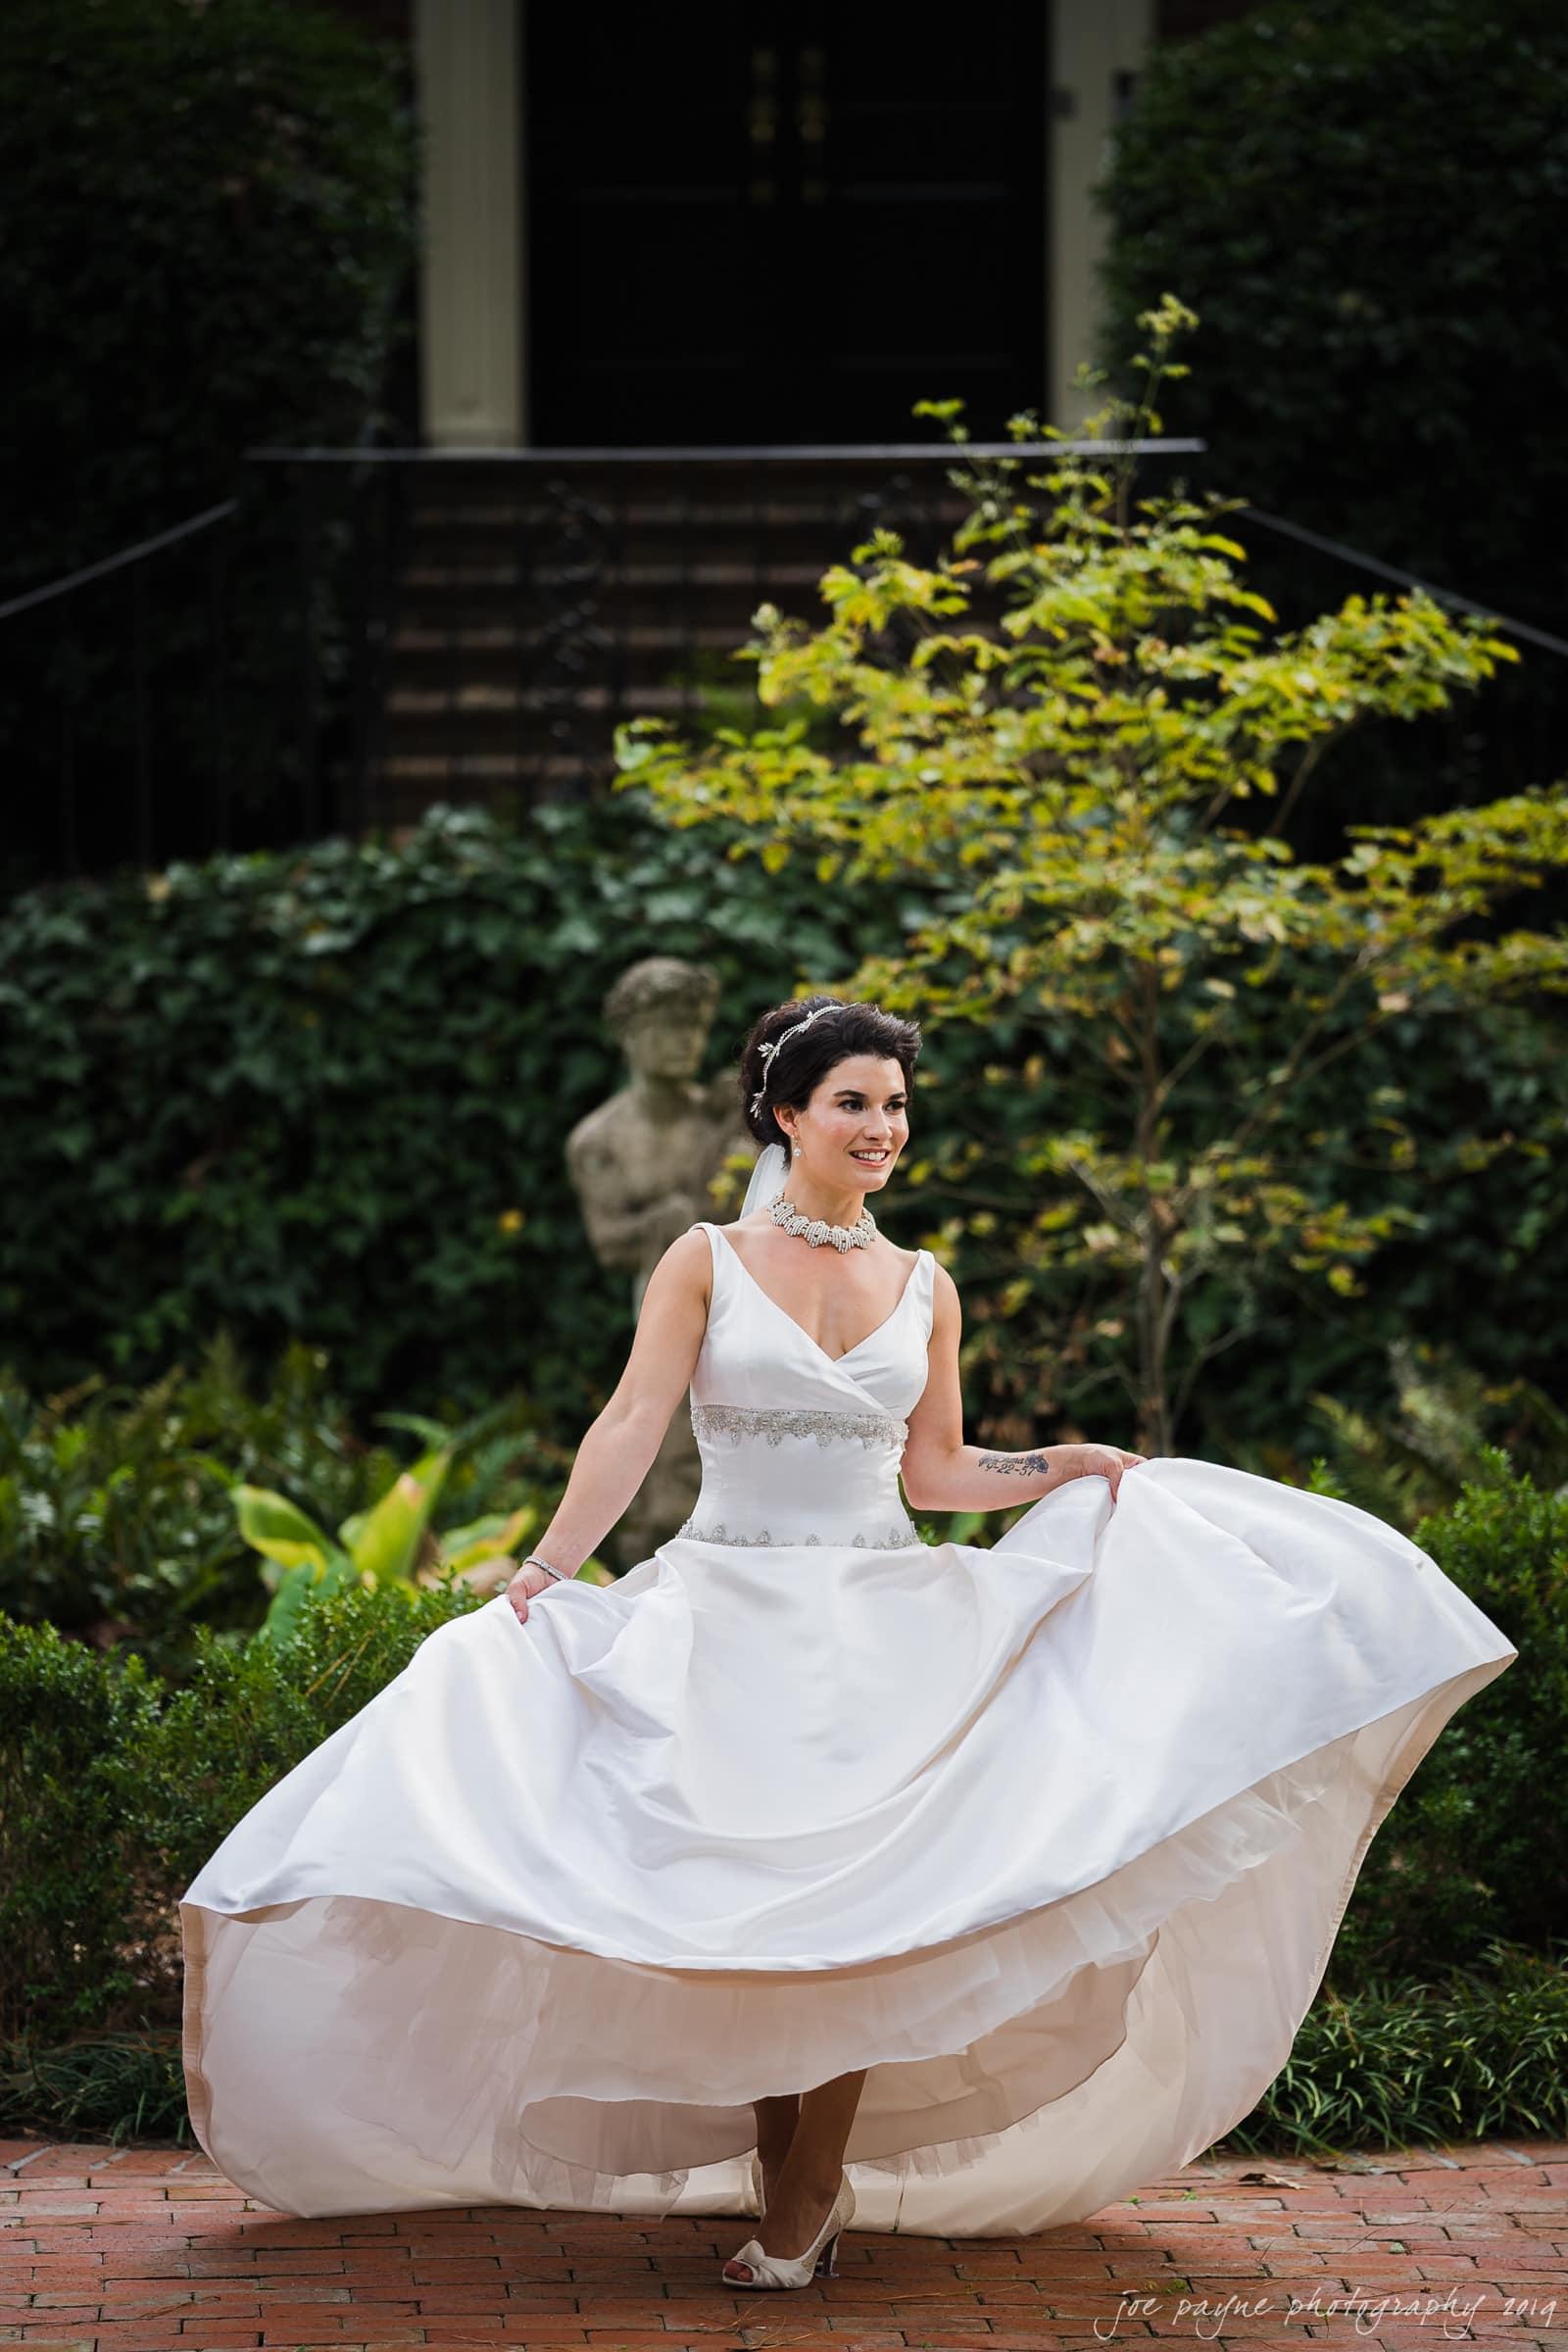 new bern wedding photography – christina's backyard bridal session